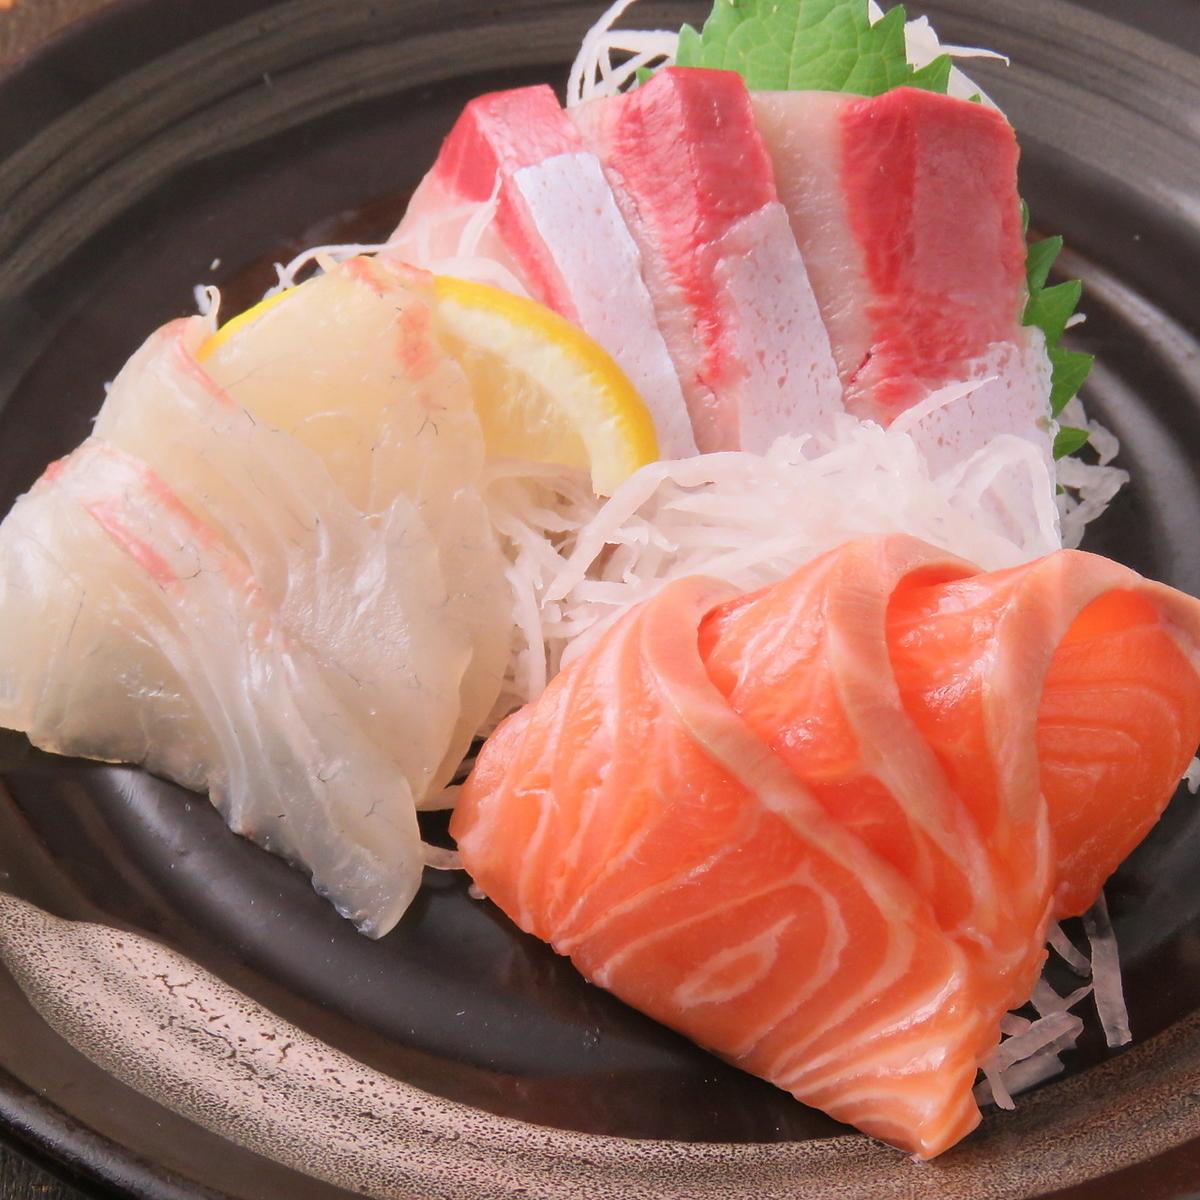 Three servings of sashimi